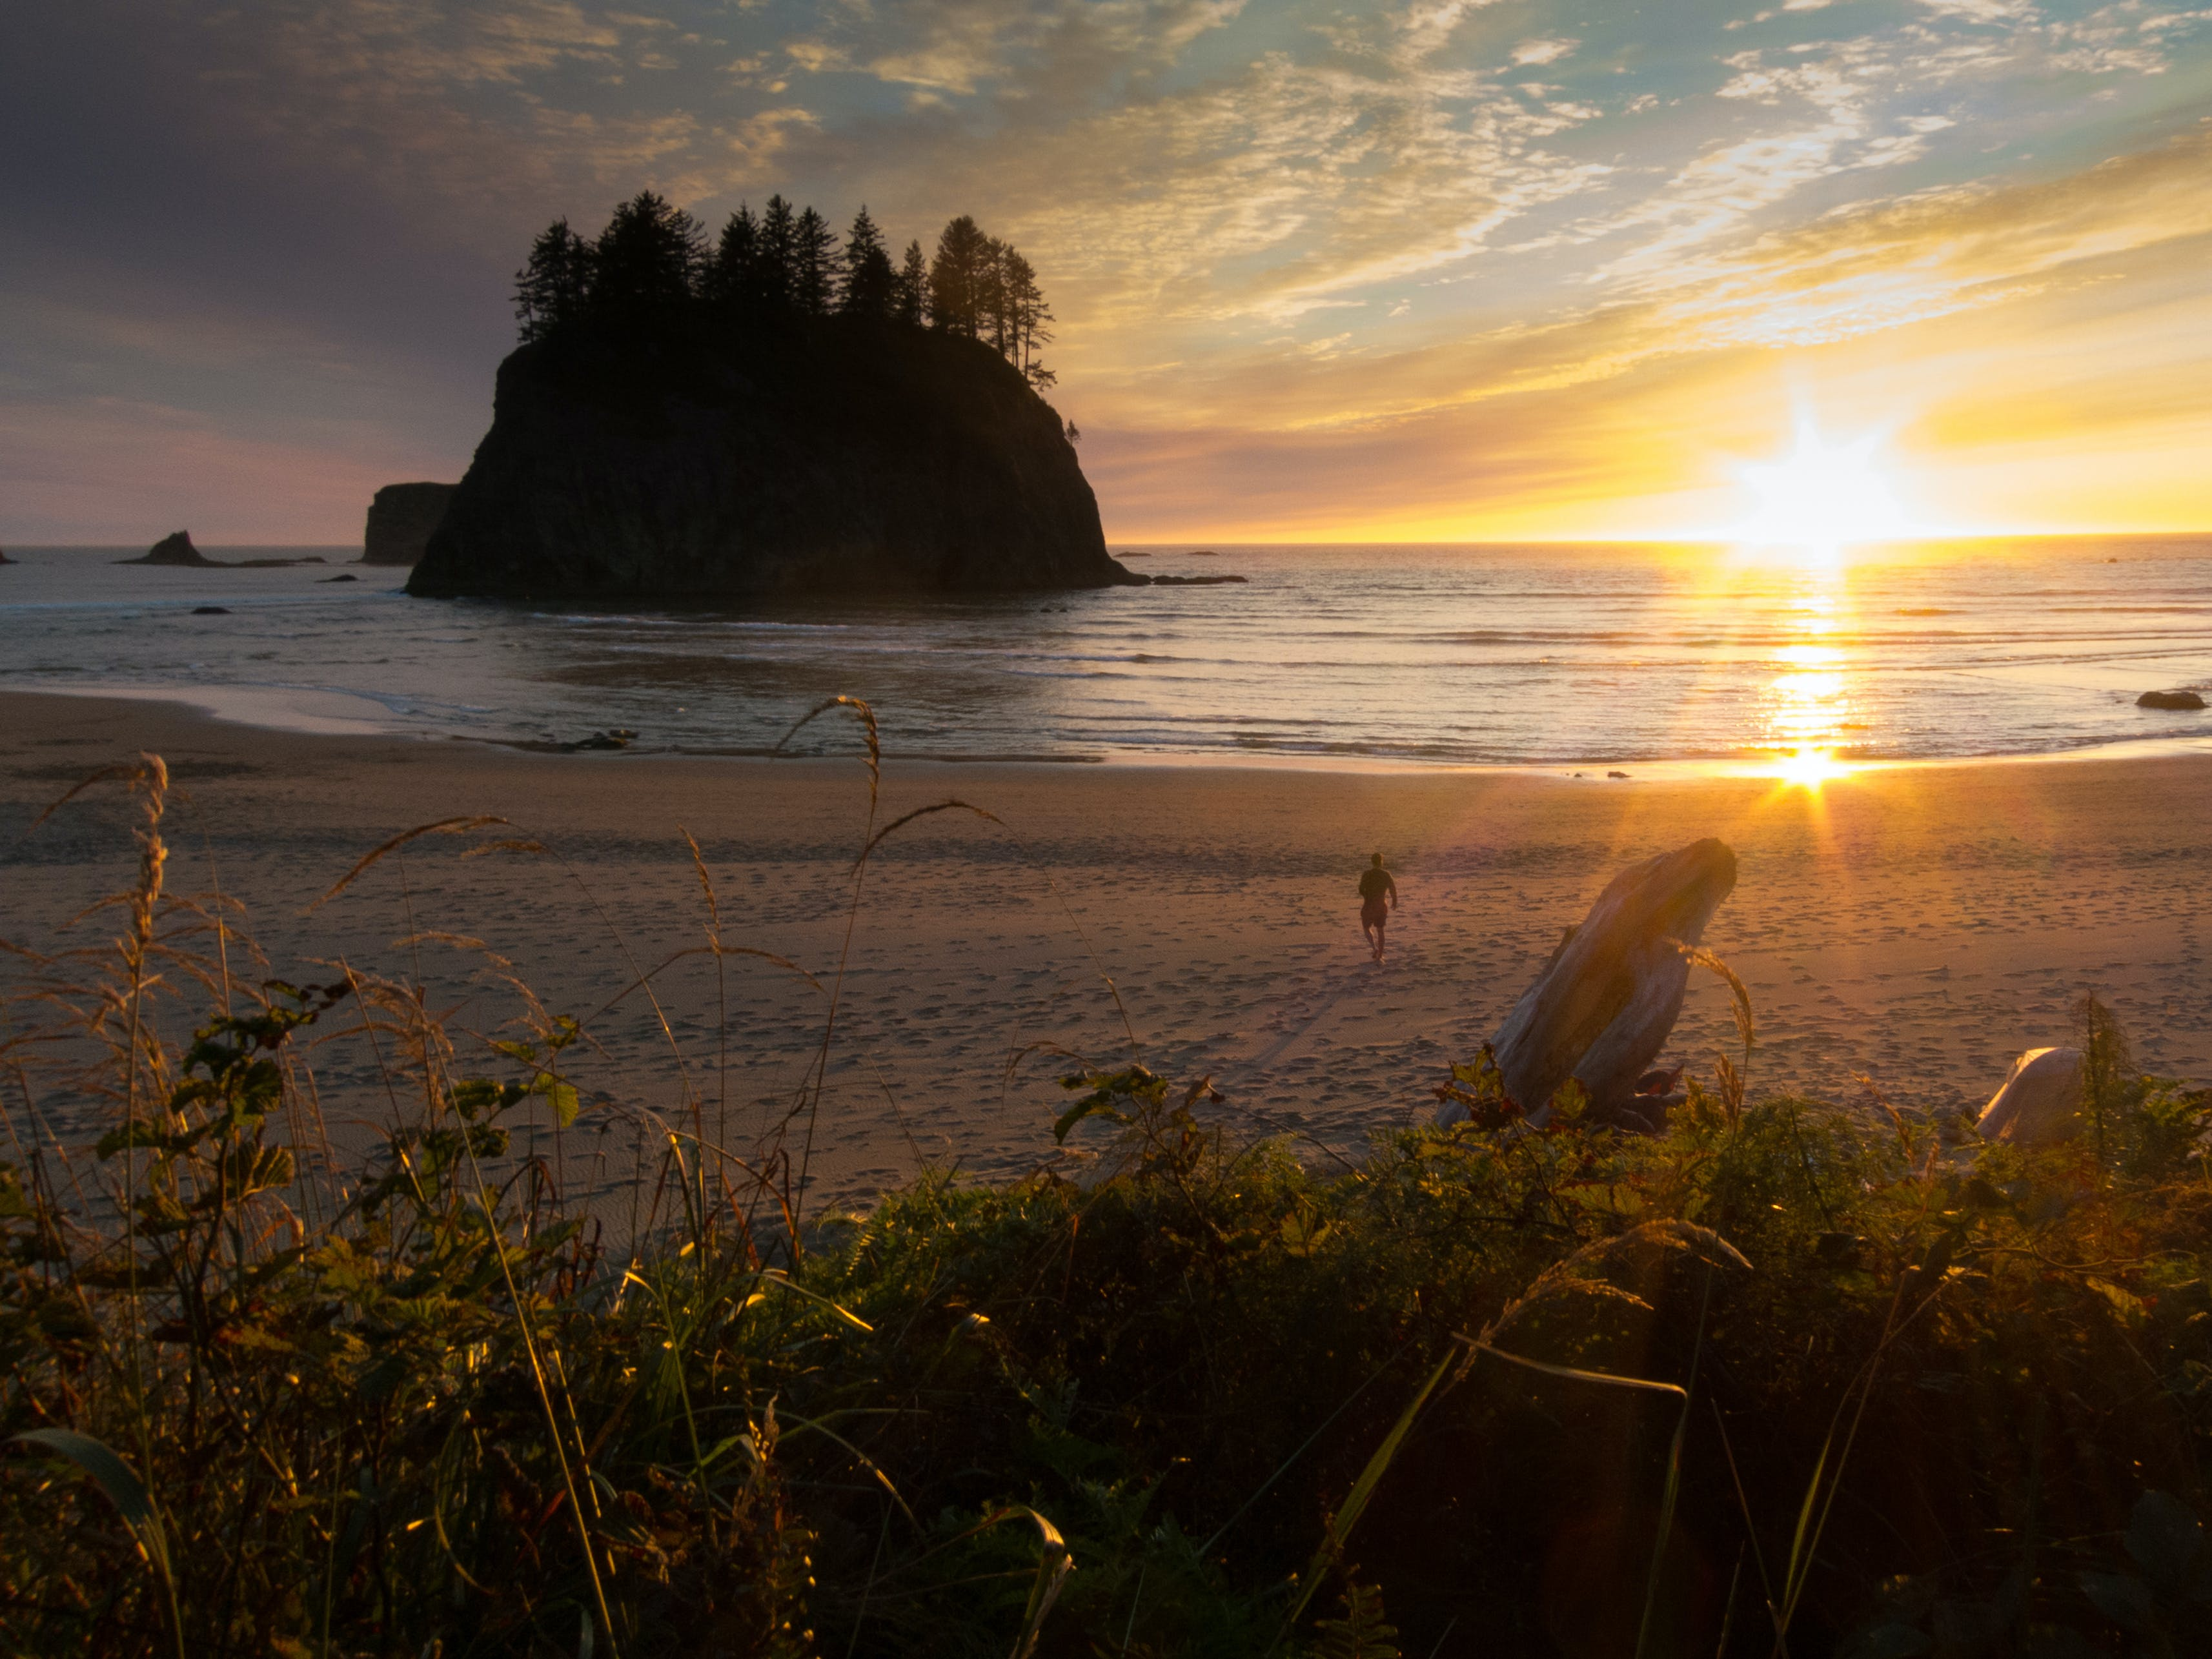 pacific beach, sunset